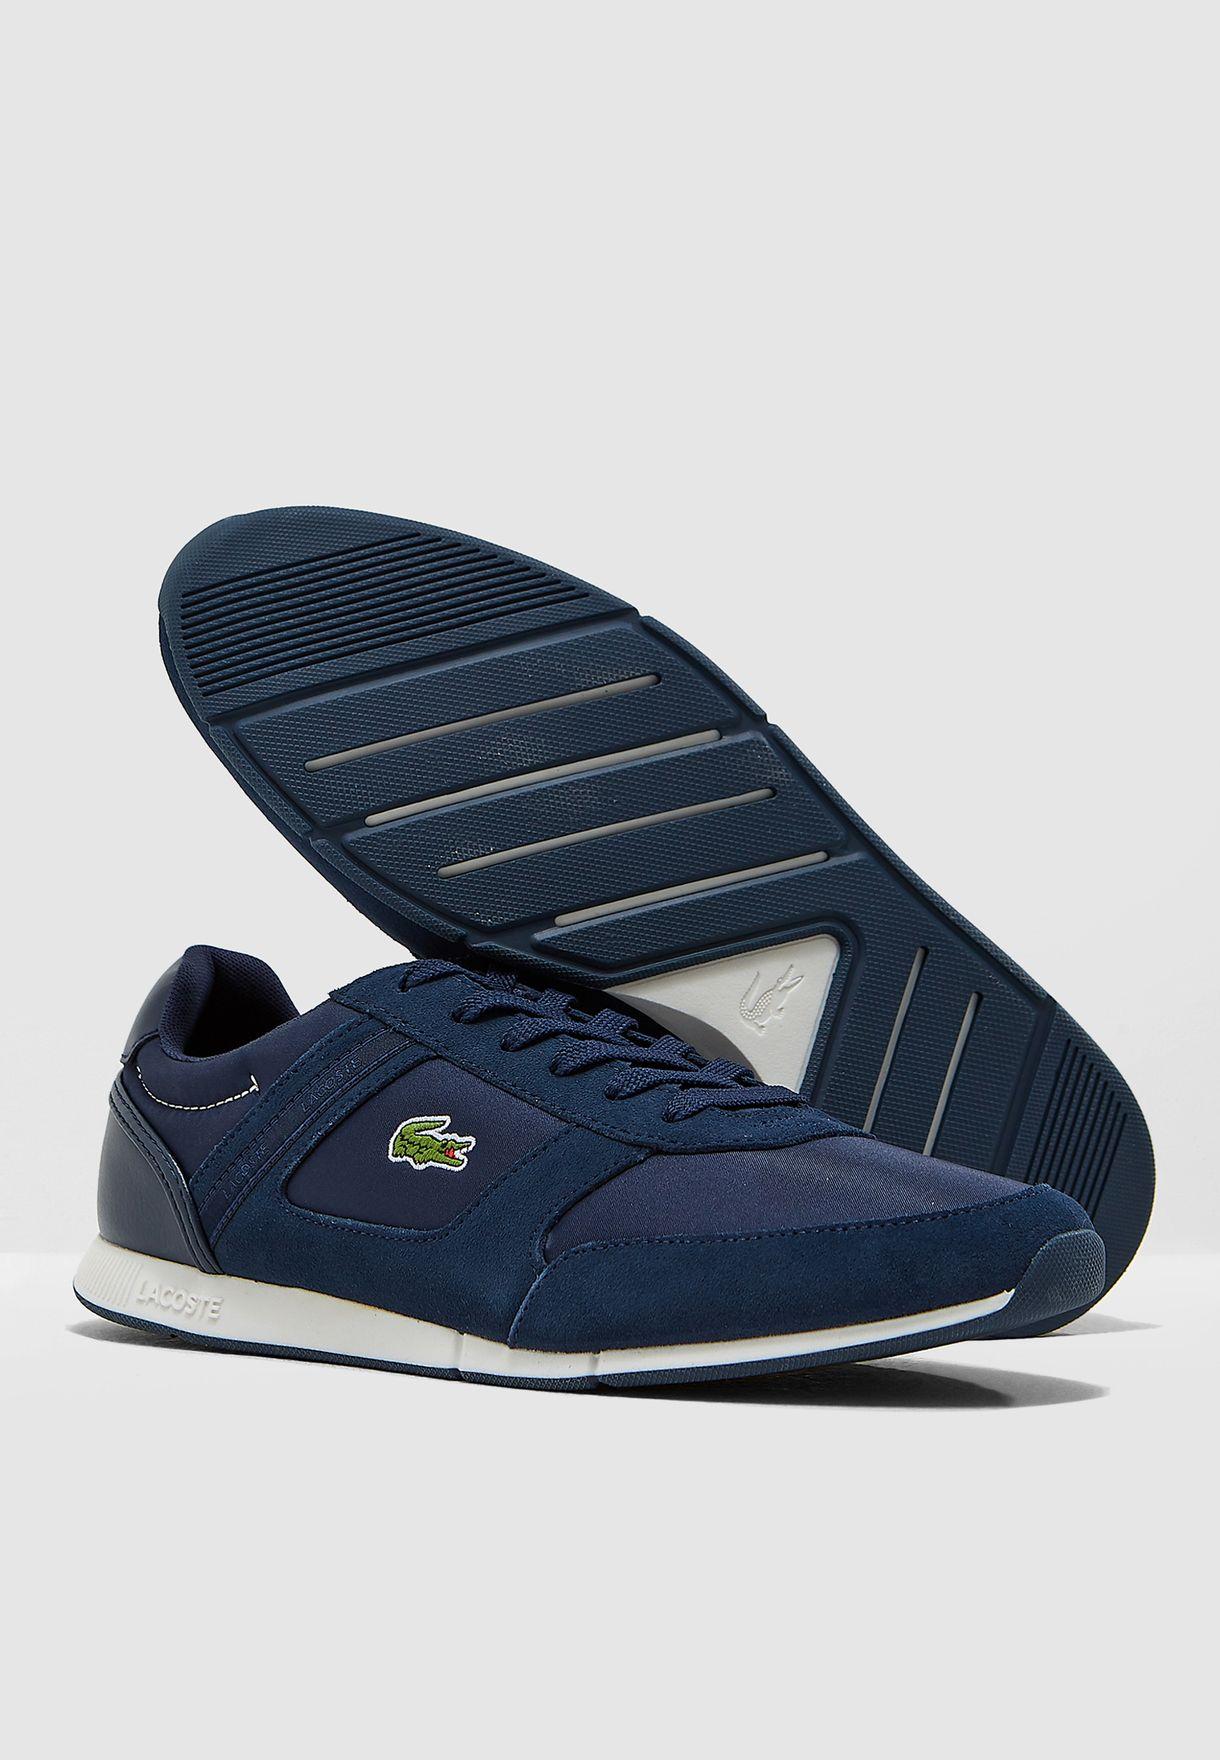 e840afd41 Shop Lacoste navy Menerva Sport Sneakers 36CAM0054ND1 for Men in ...